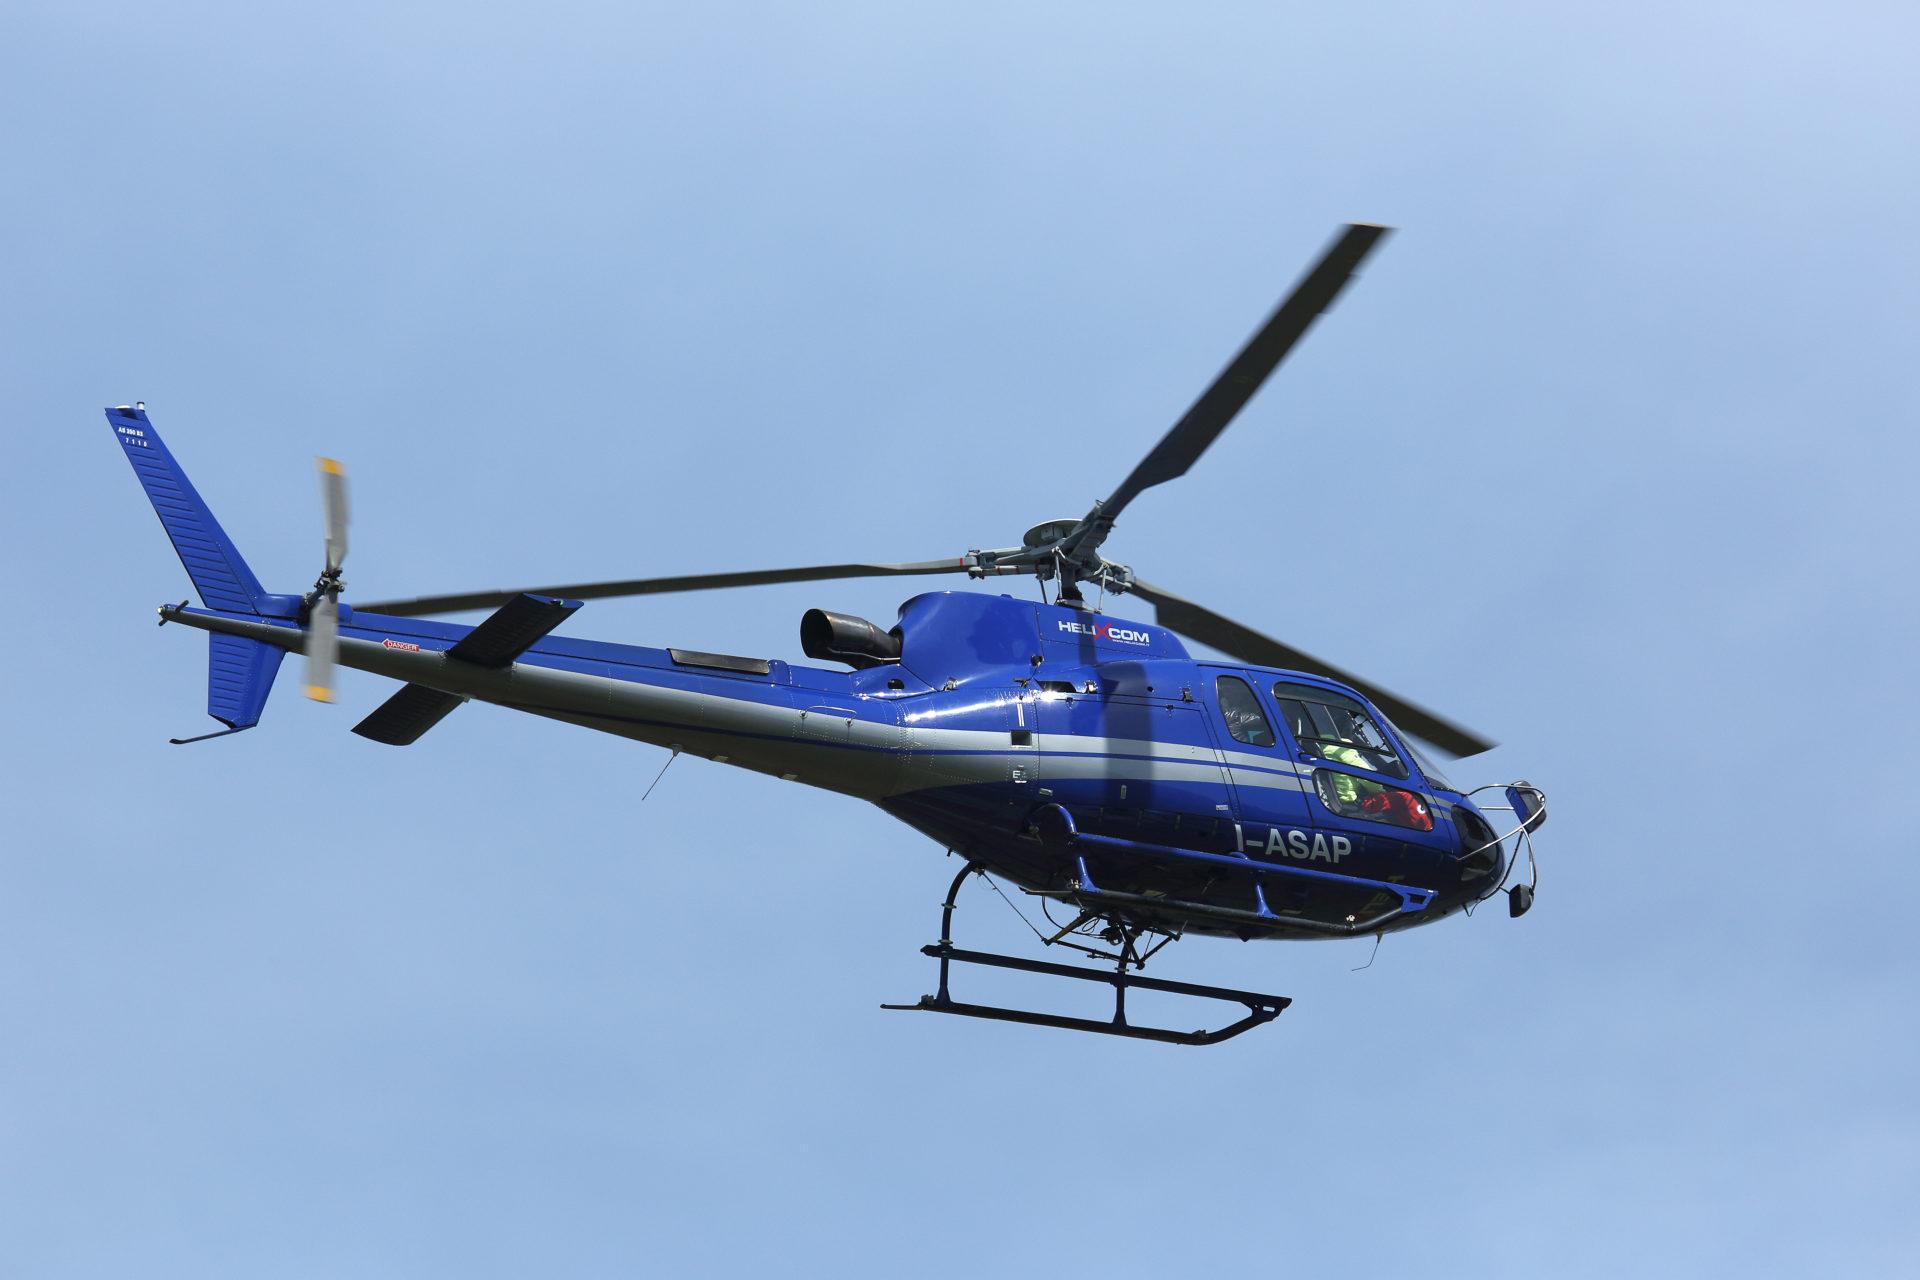 Trasporto in elicottero